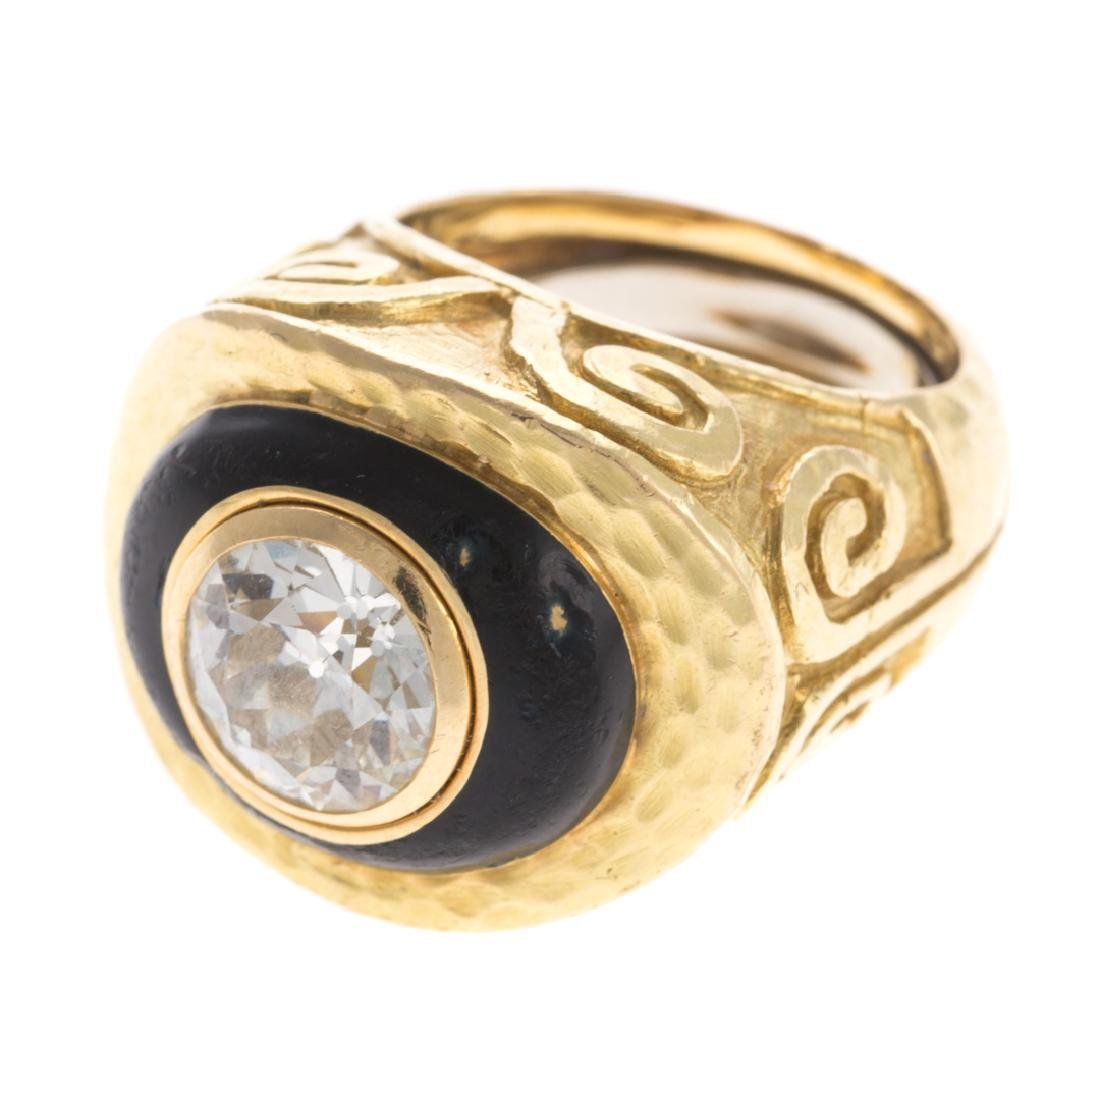 A 18K Diamond Ring & Enamel by David Webb - 6